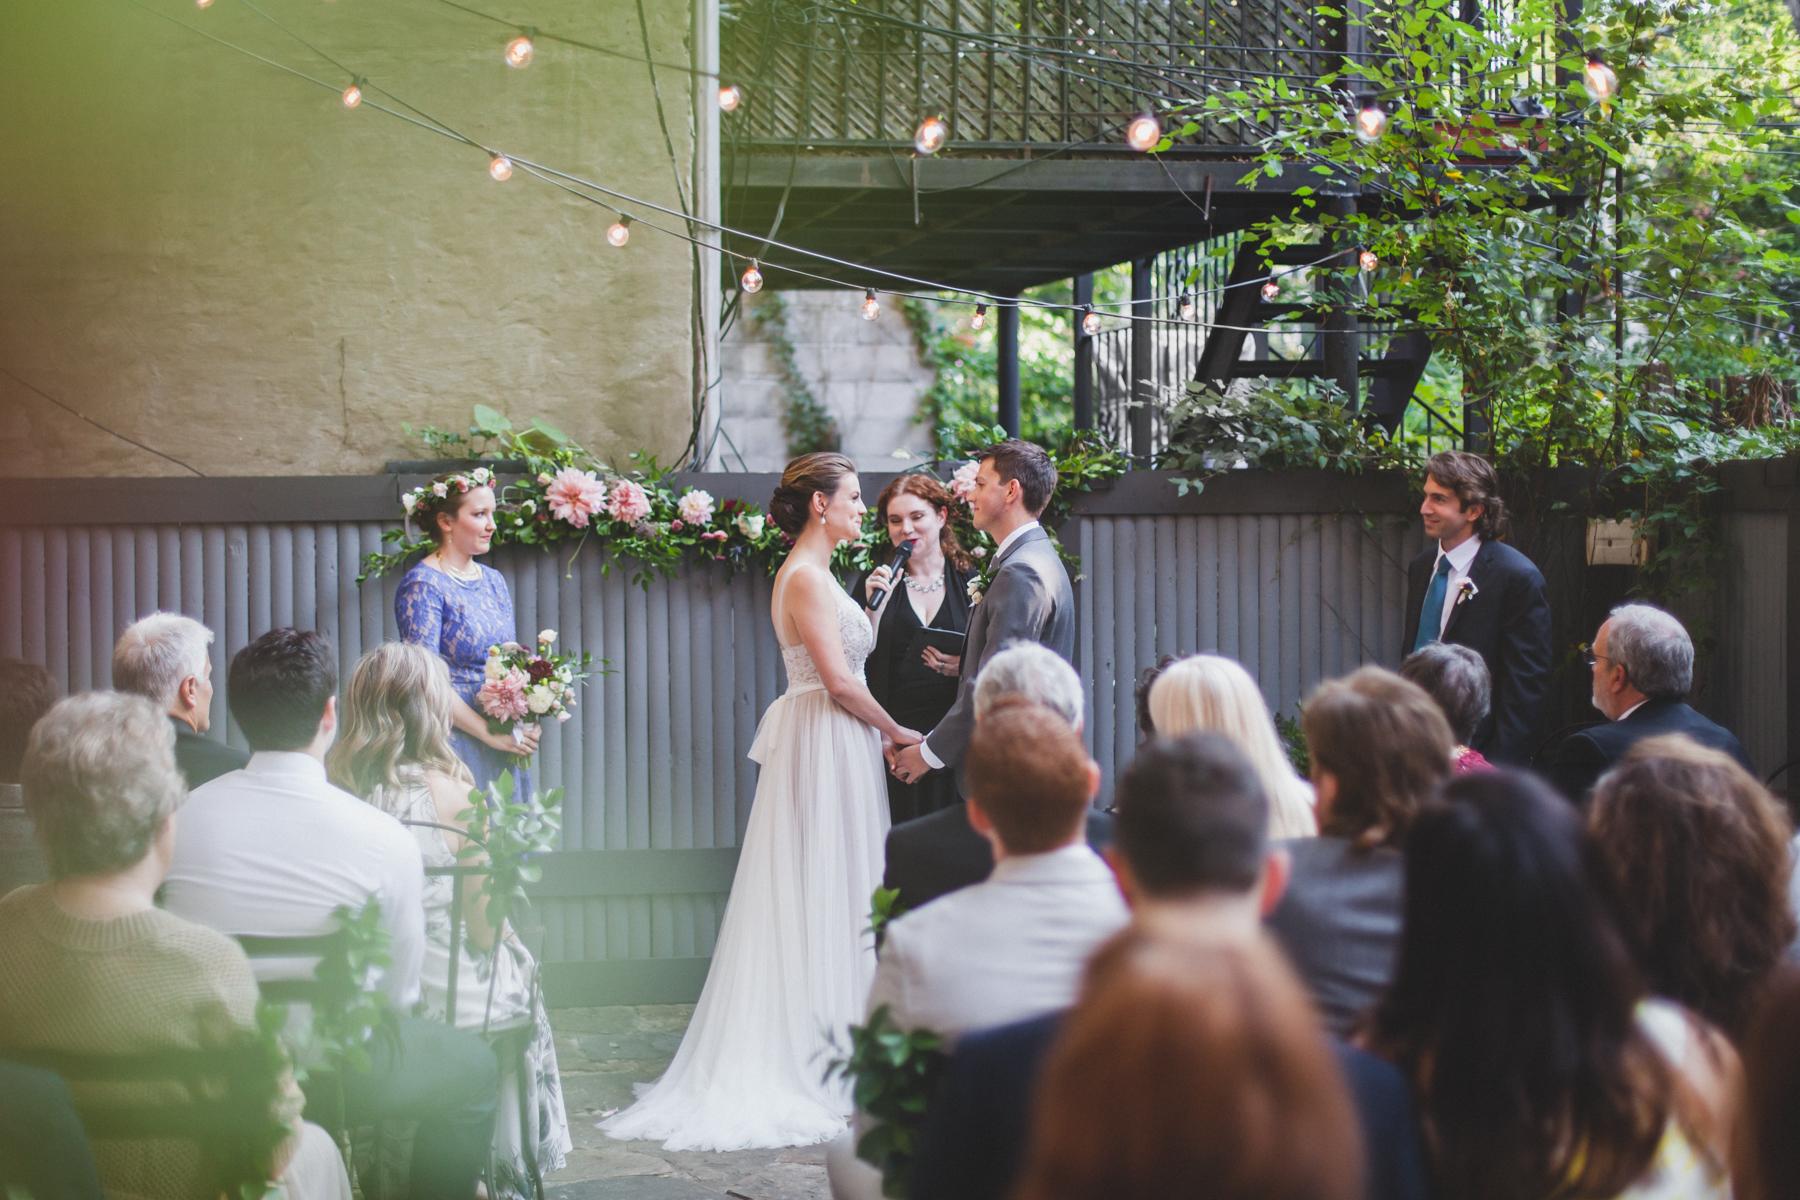 ICI-Restaurant-Fort-Greene-Brooklyn-Intimate-Documentary-Wedding-Photography-Elvira-Kalviste-37.jpg